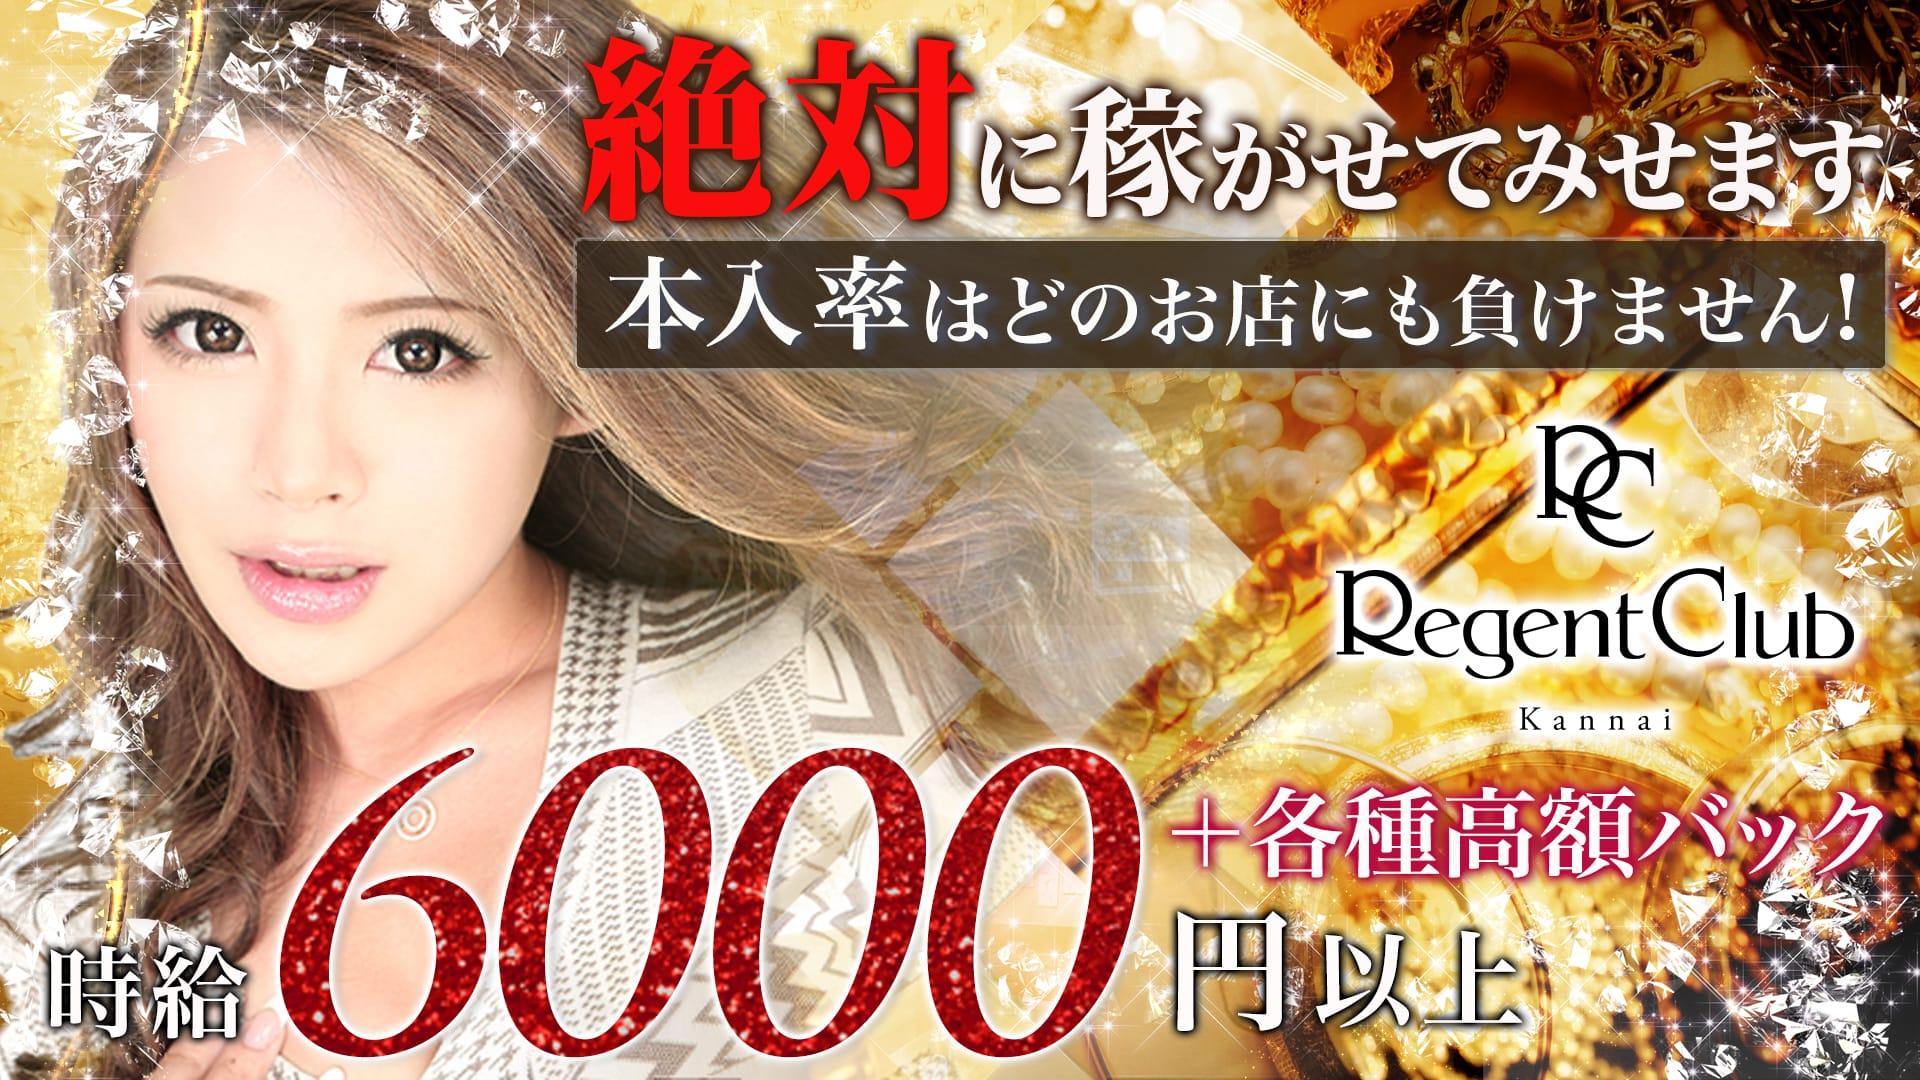 Regent Club Kannai~リージェントクラブ~ 関内キャバクラ TOP画像